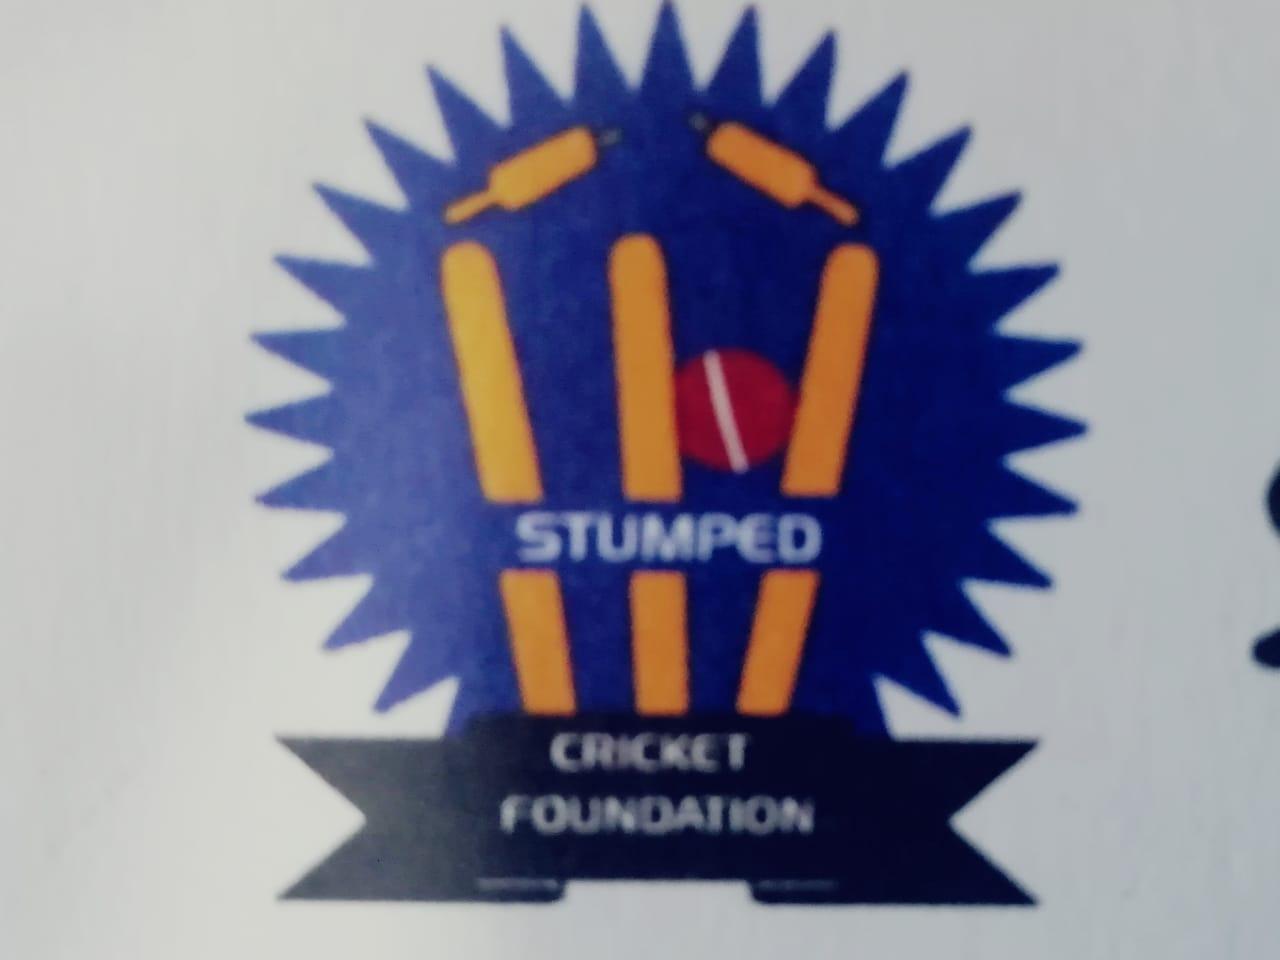 STUMPED CRICKET FOUNDATION